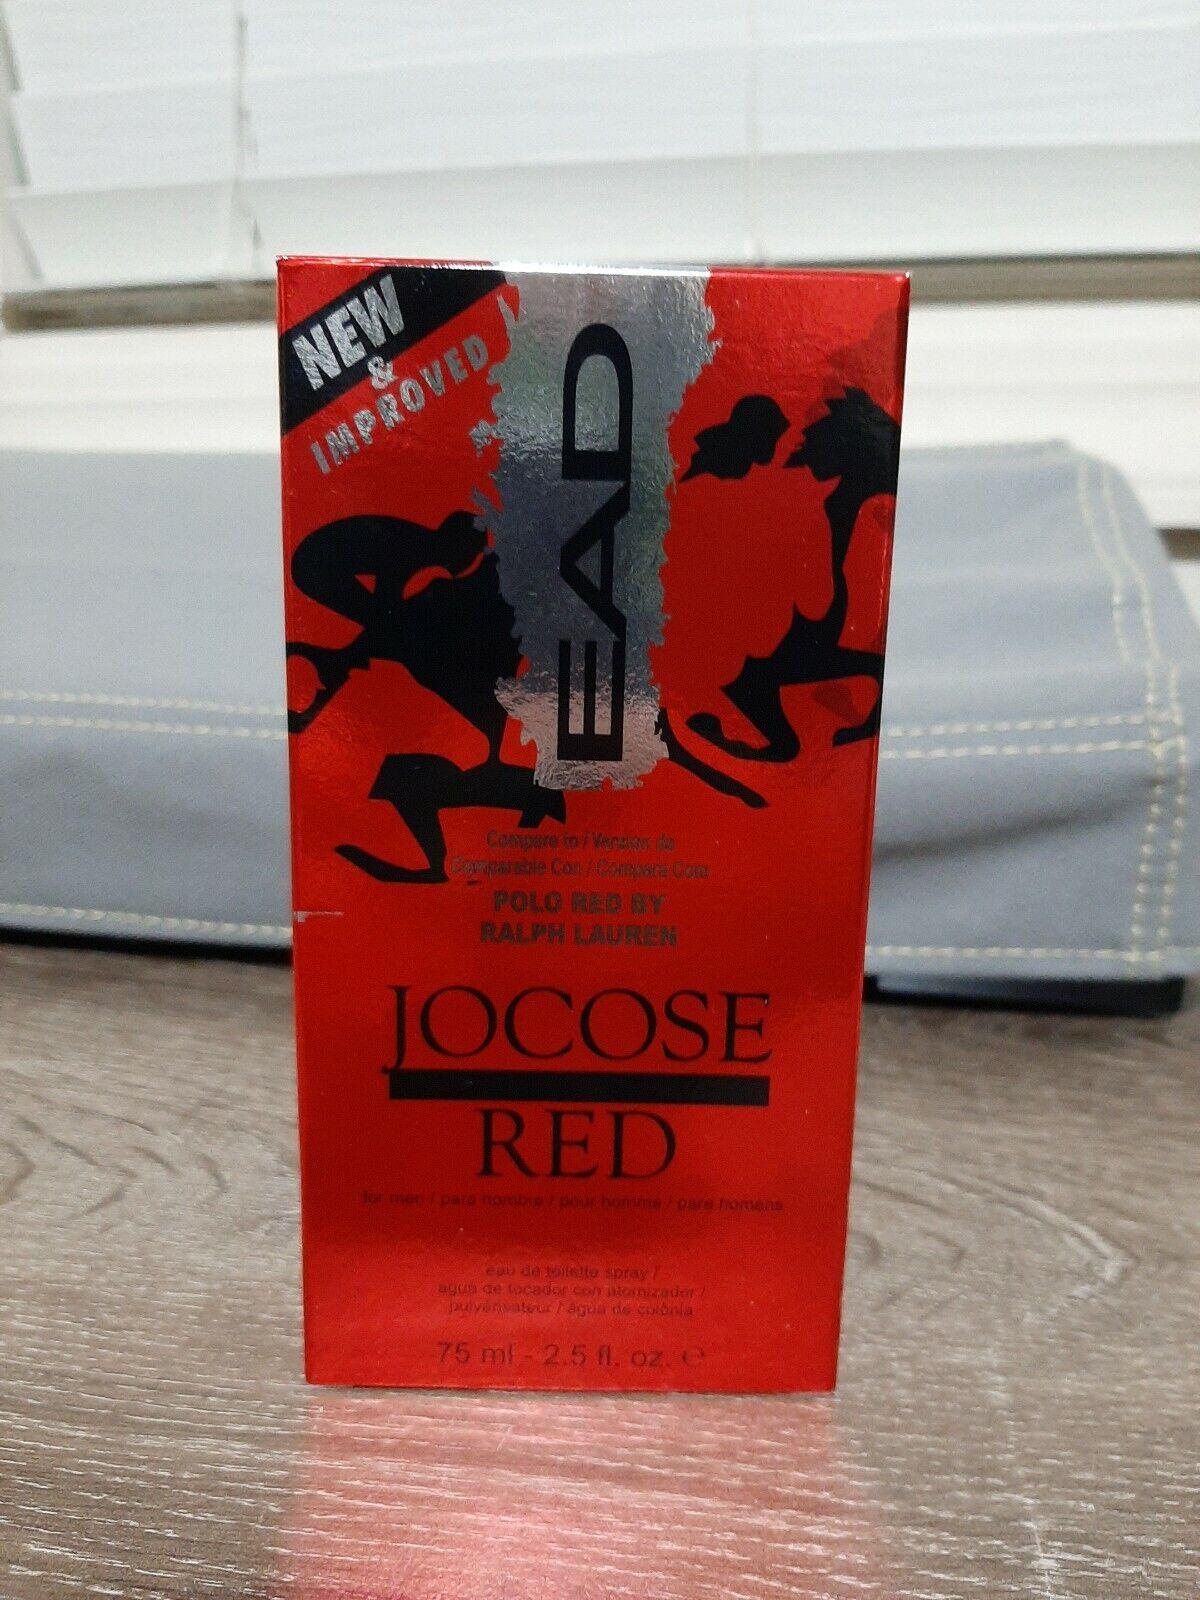 JOCOSE RED